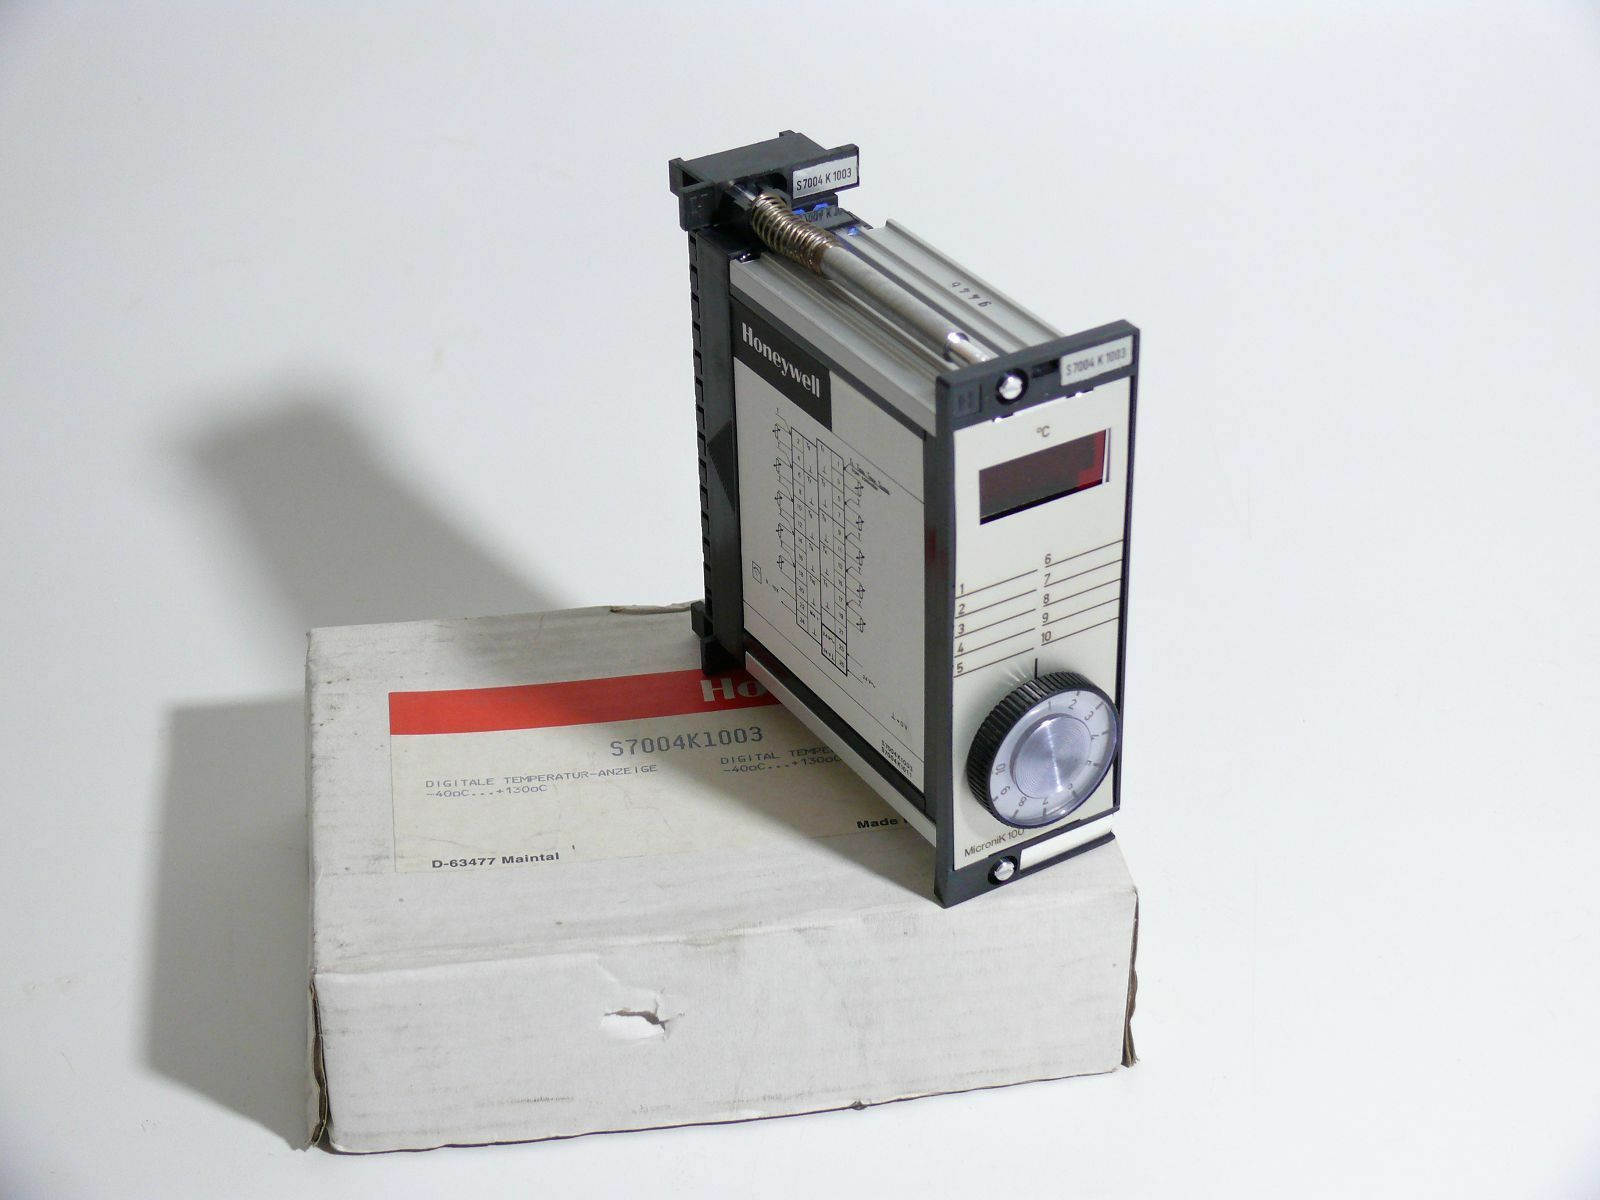 HONEYWELL Digitale Temperatur-Anzeige Indicator Micronik S7004K1003